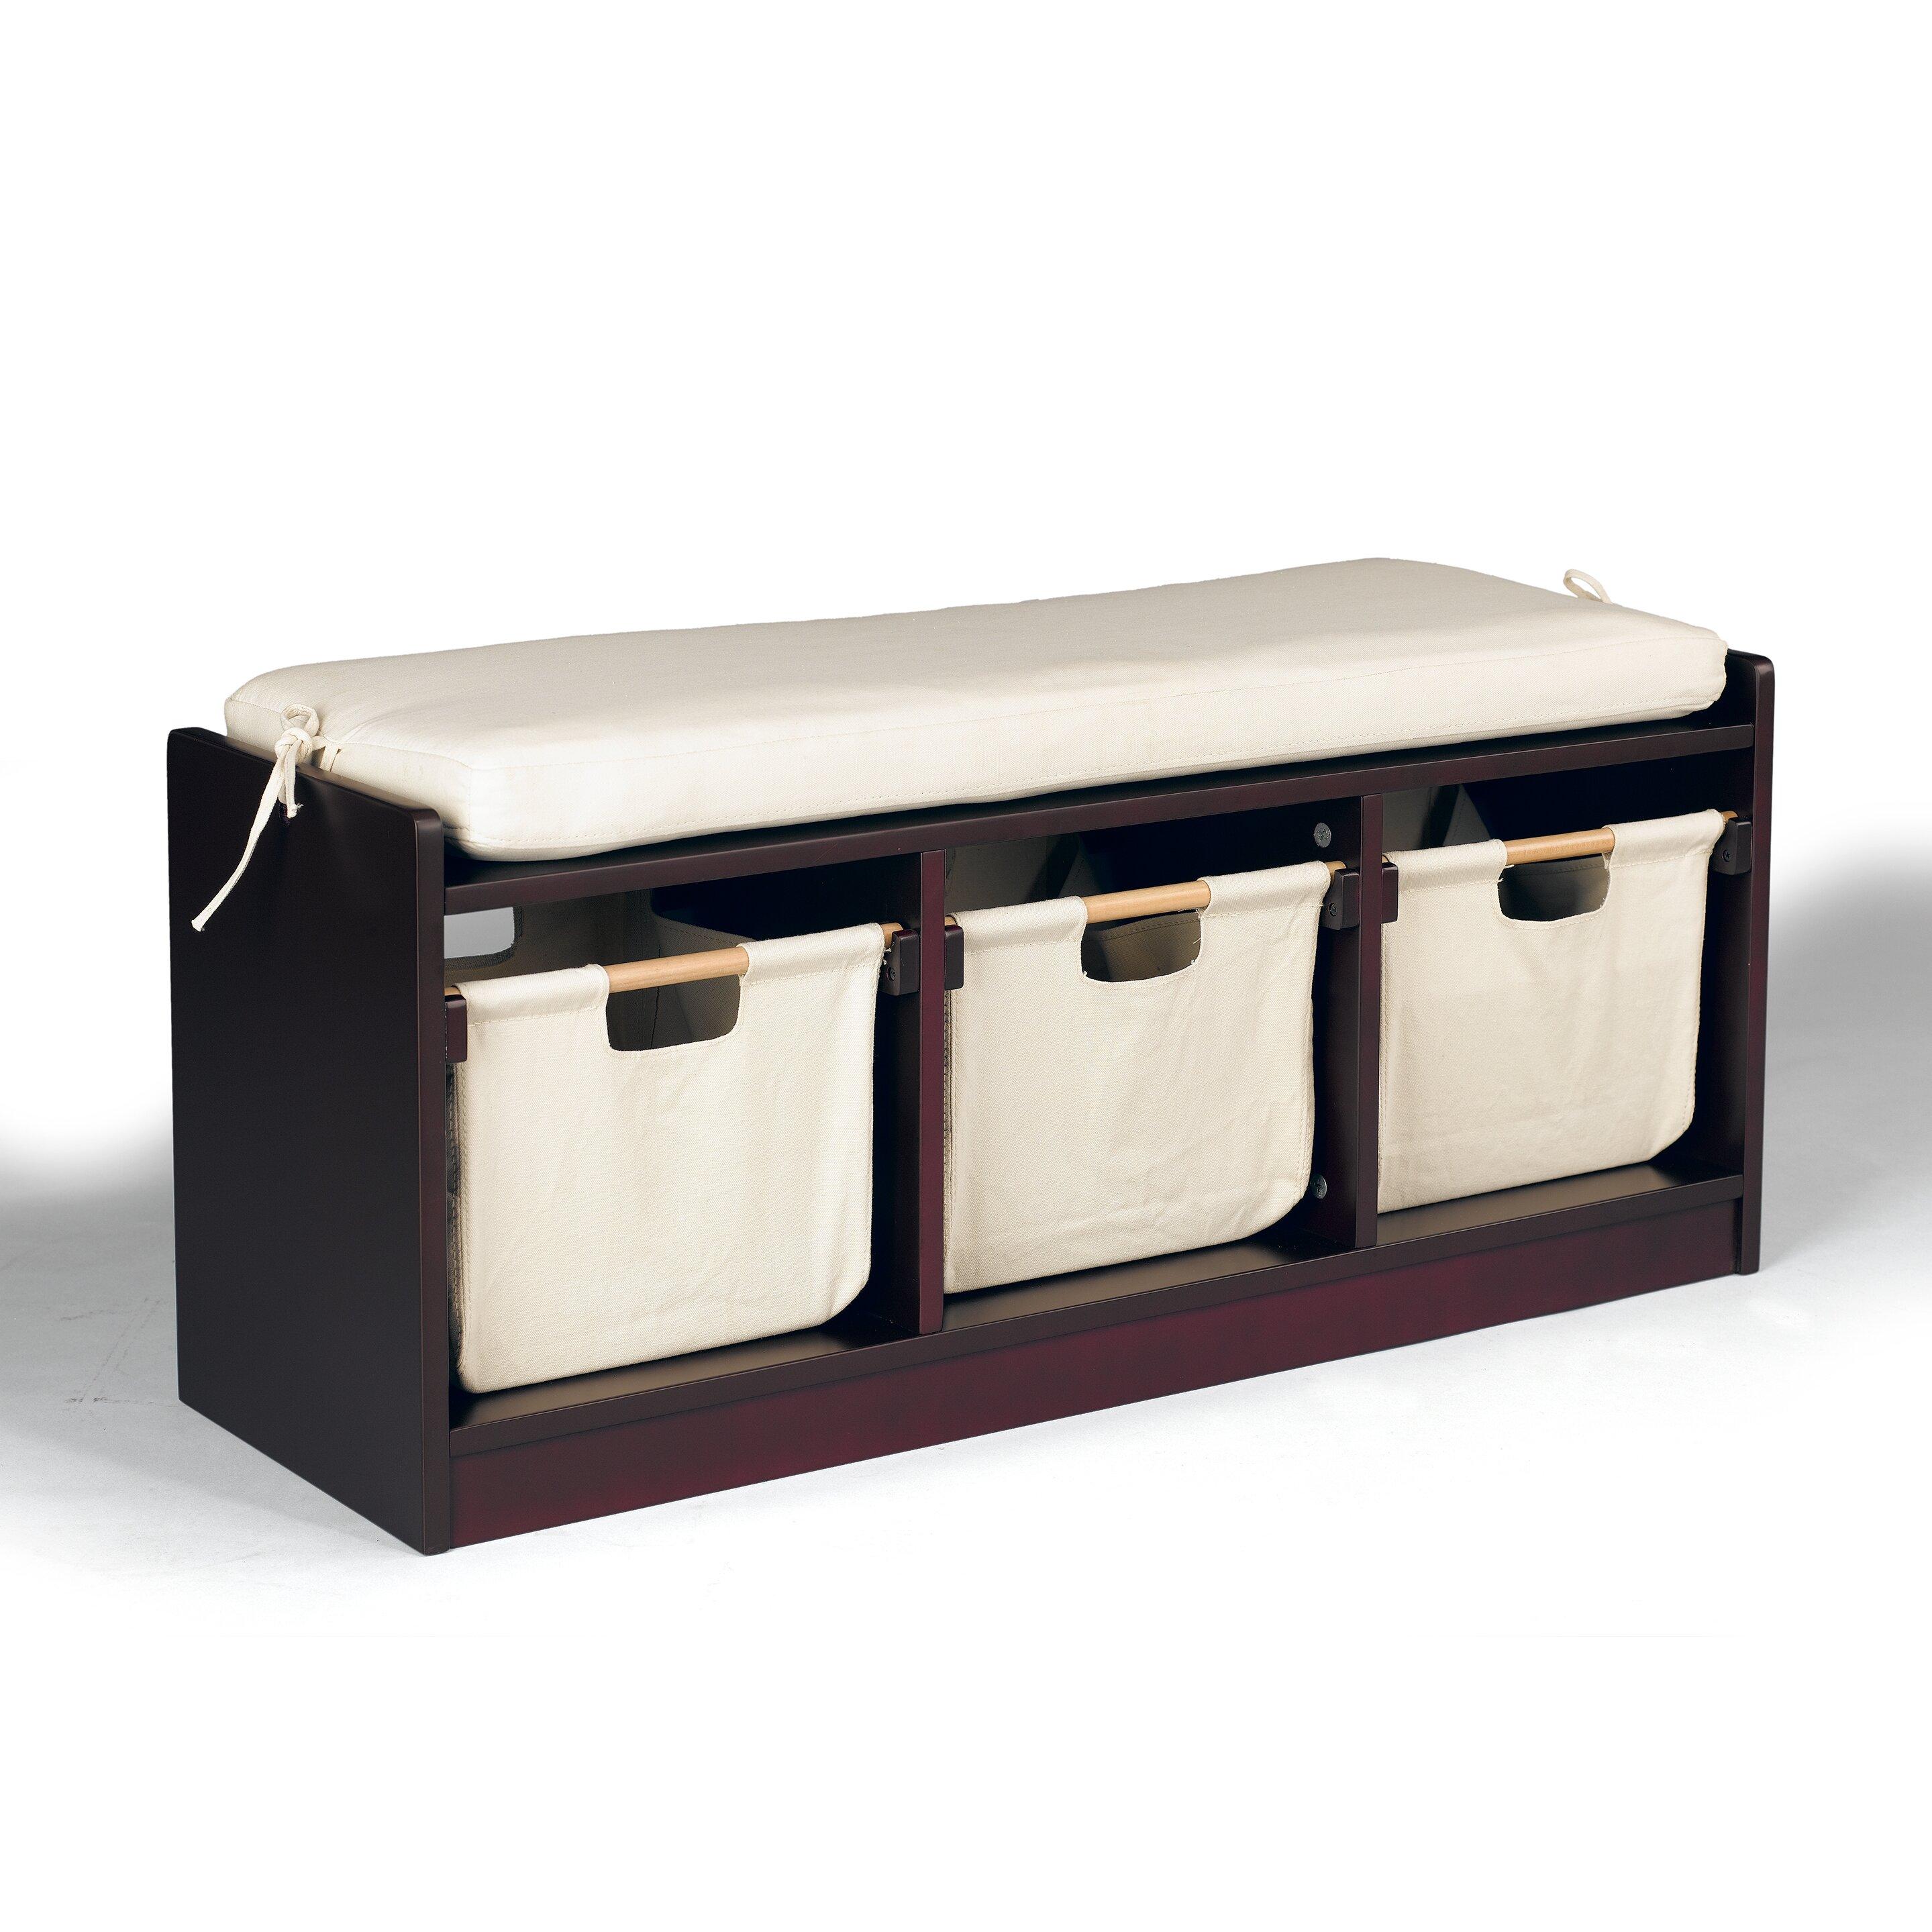 Kids Storage Bench Furniture Toy Box Bedroom Playroom: Sunnywood WonkaWoo Deluxe Children Toy Storage Bench